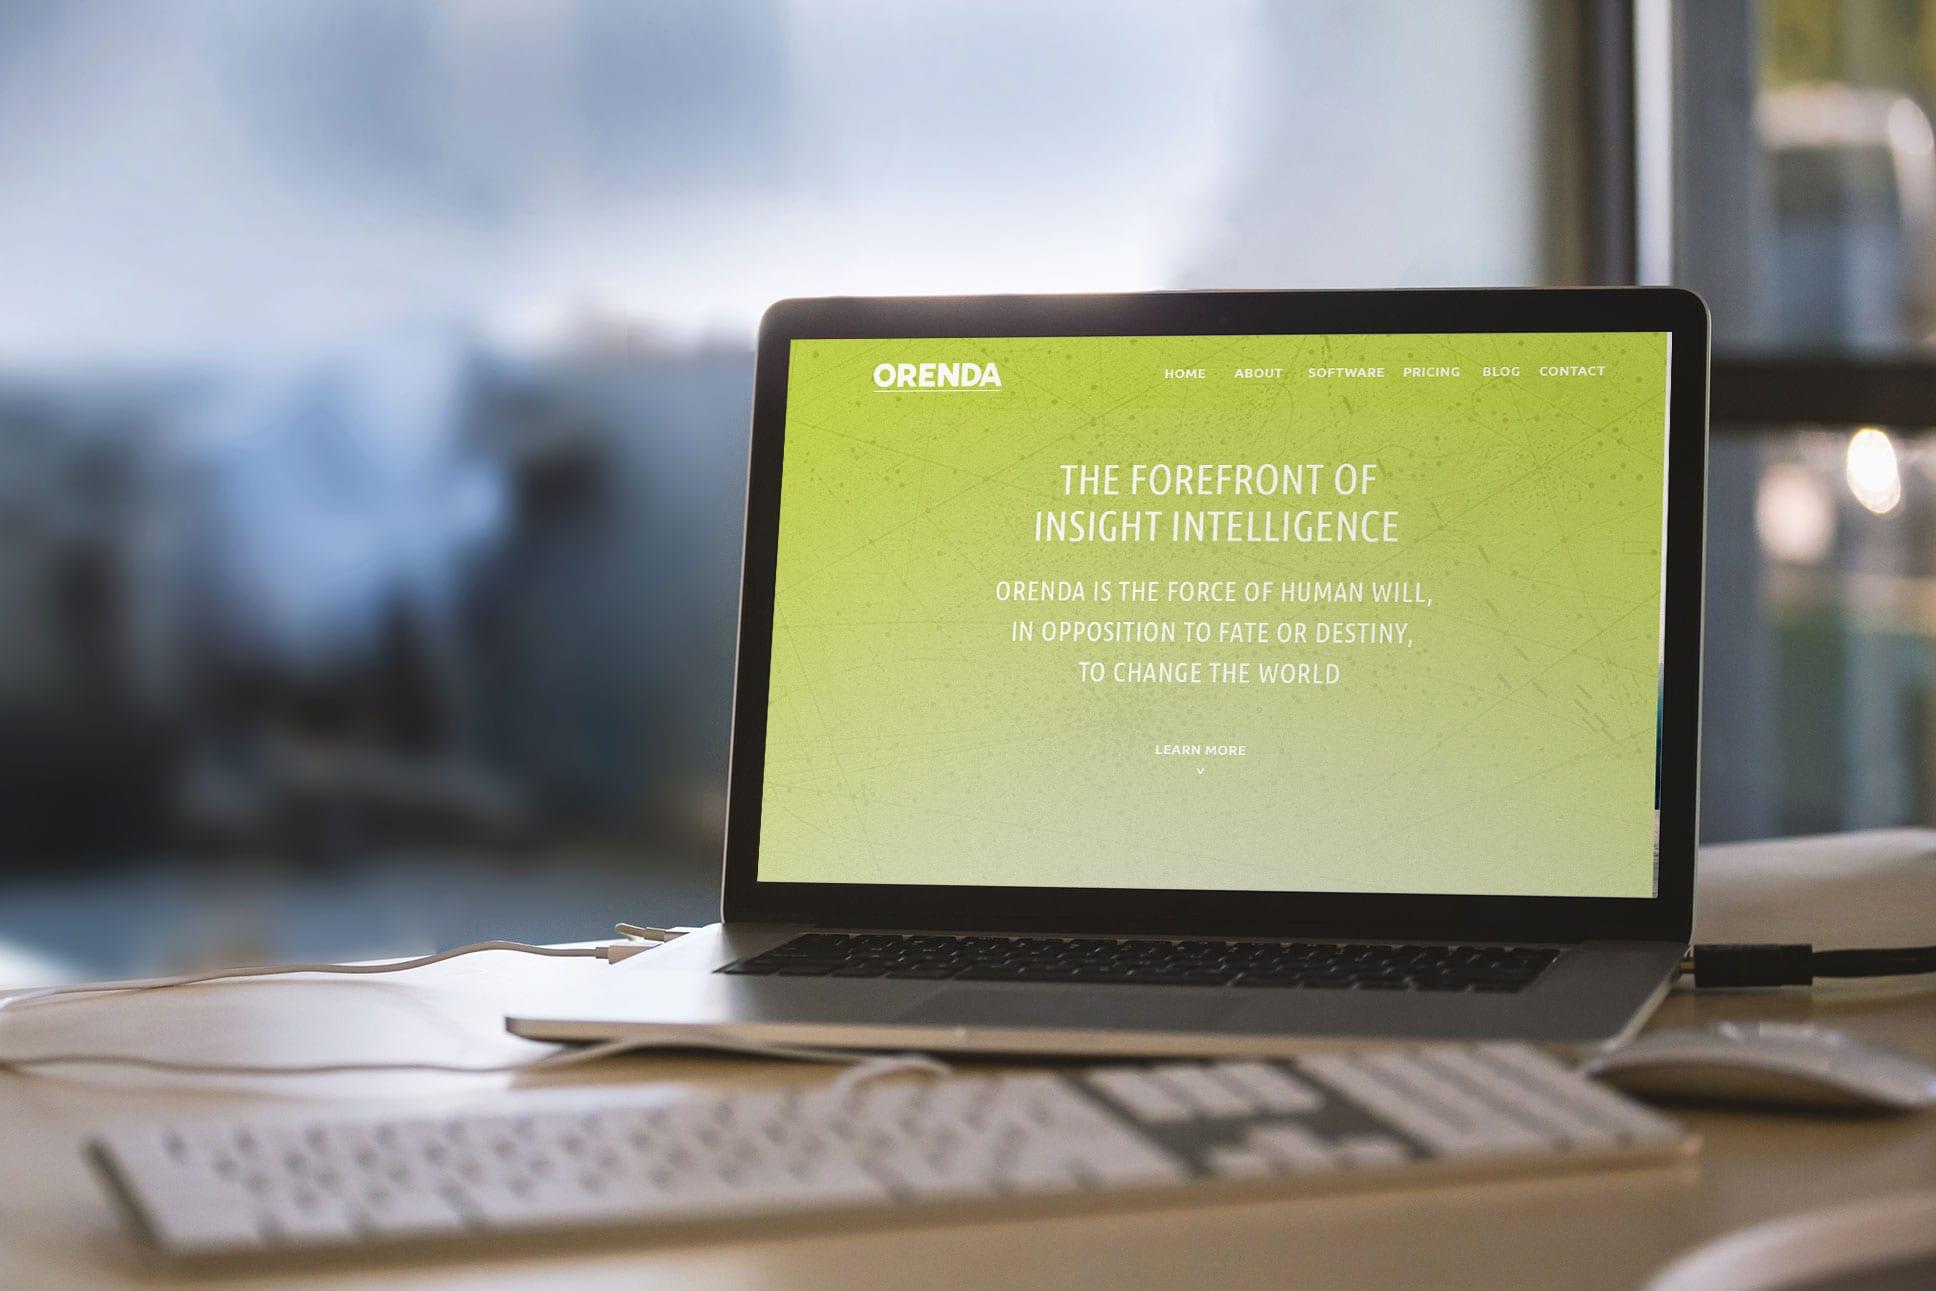 macbook-Orenda-mockup-min.jpg